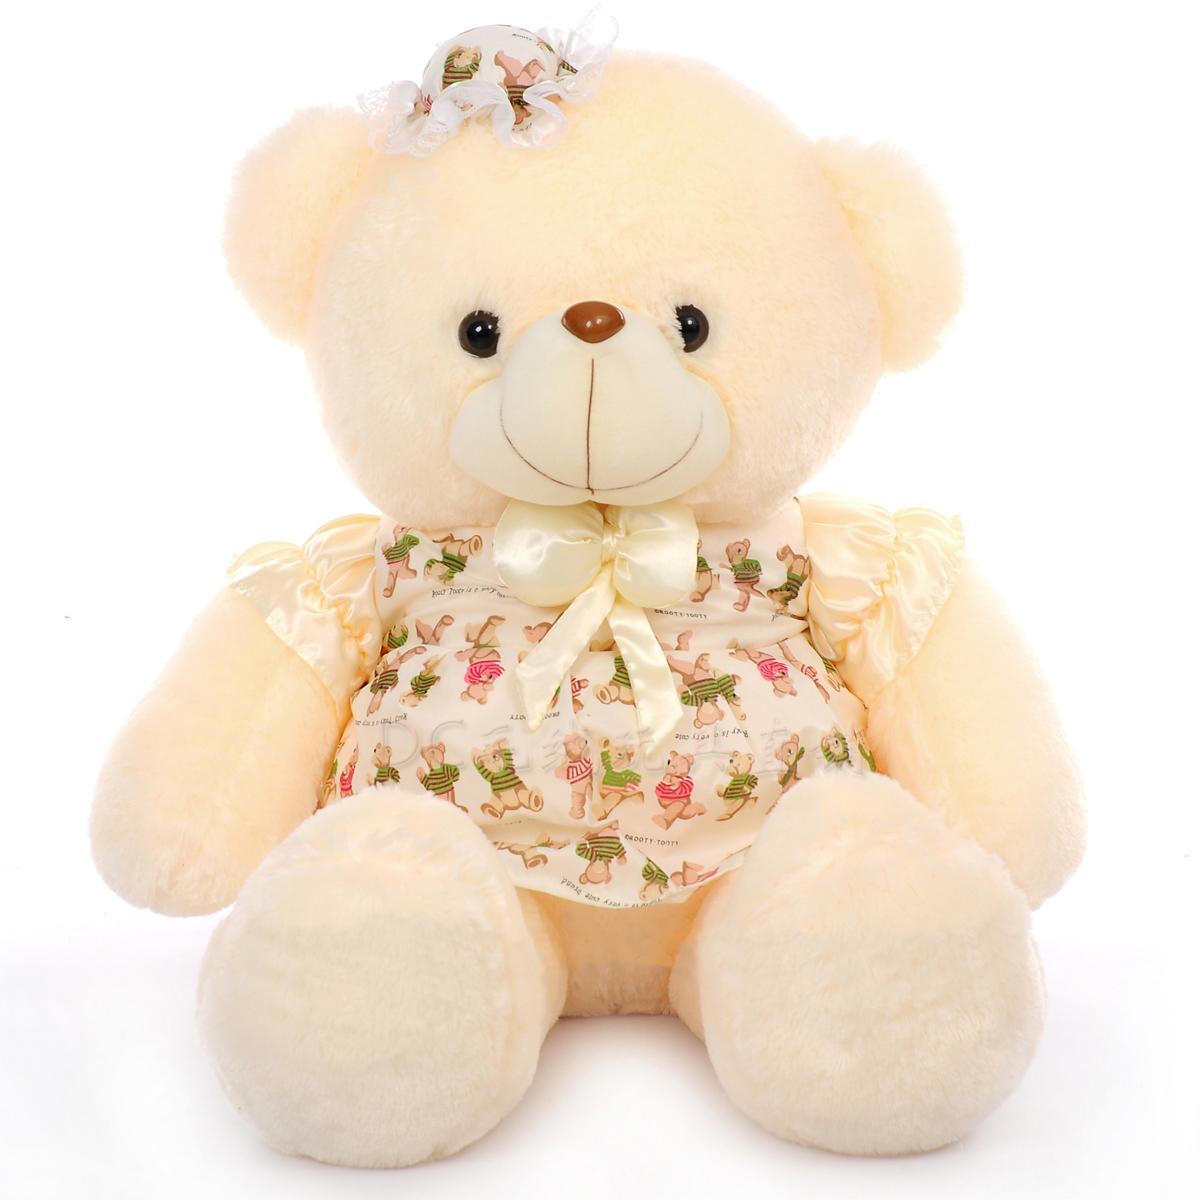 Free Wallpapers Of Cute Teddy Bears Cute Teddy Bear 1397 1200x1200 Px Hdwallsource Com